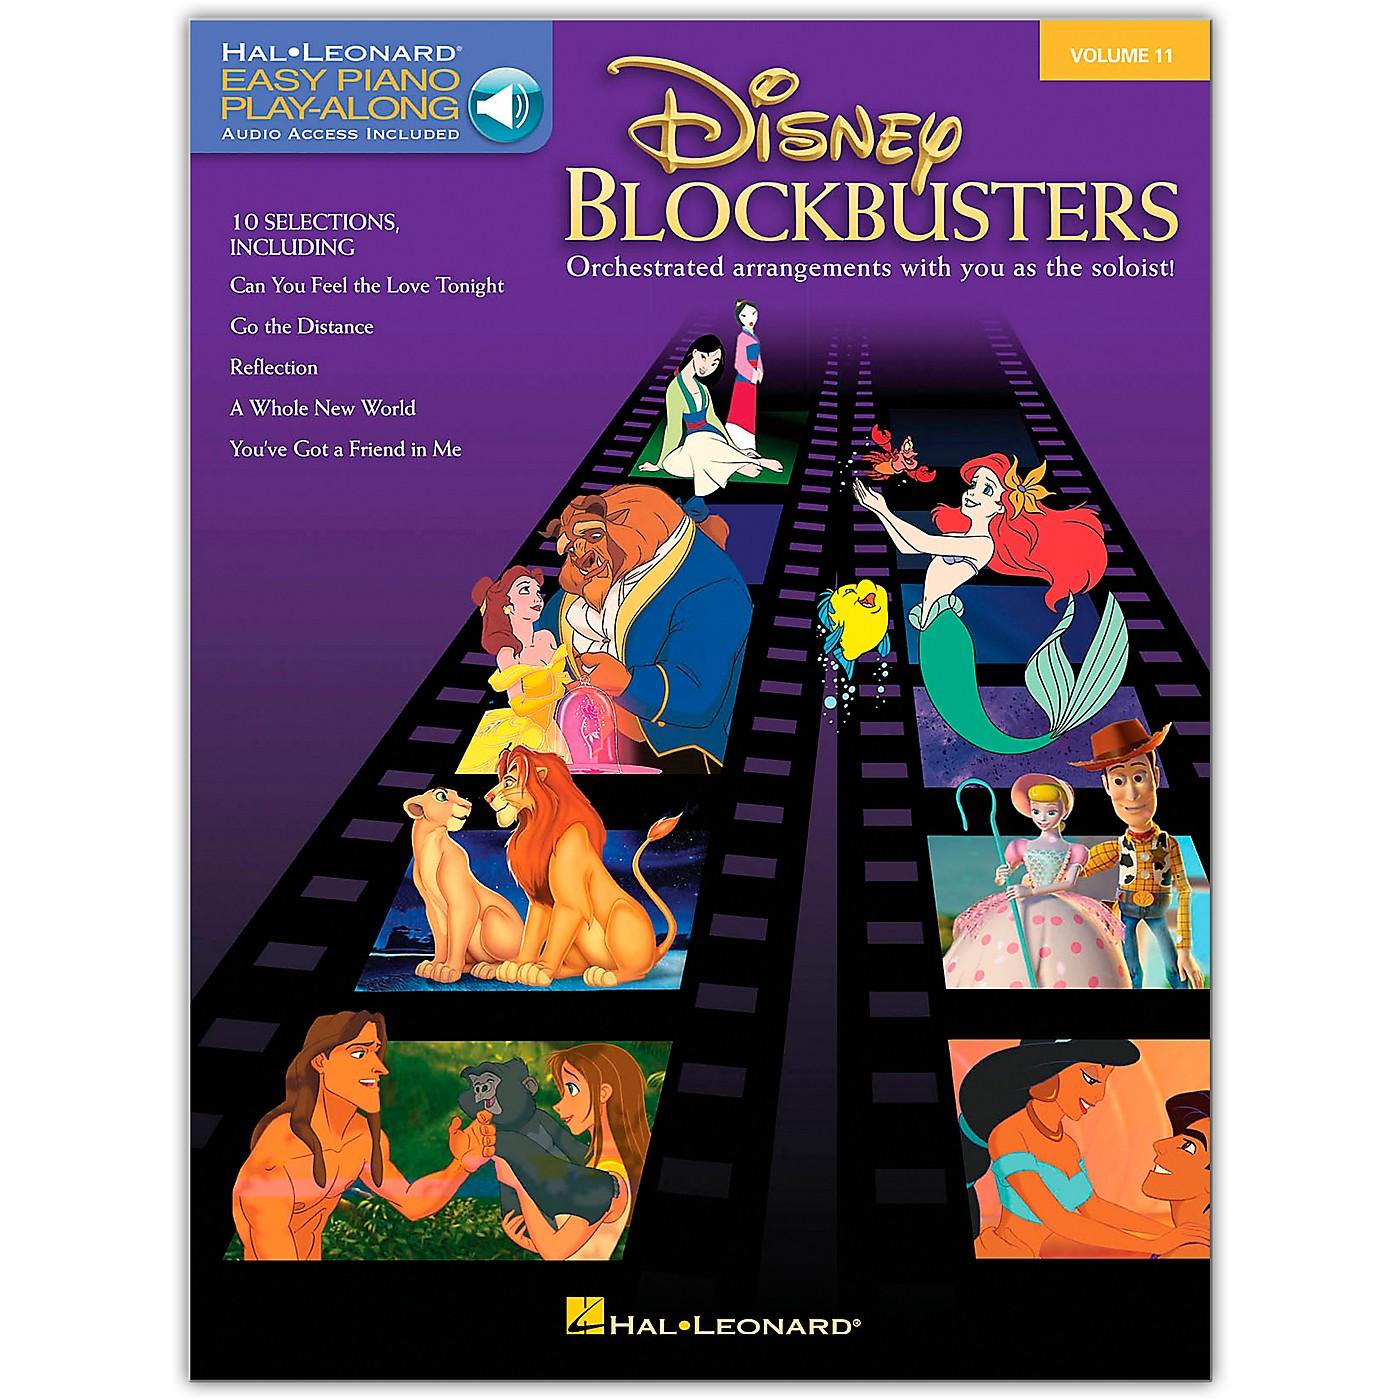 Hal Leonard Disney Blockbusters - Easy Piano Play-Along Volume 11 (Book/Online Audio) thumbnail